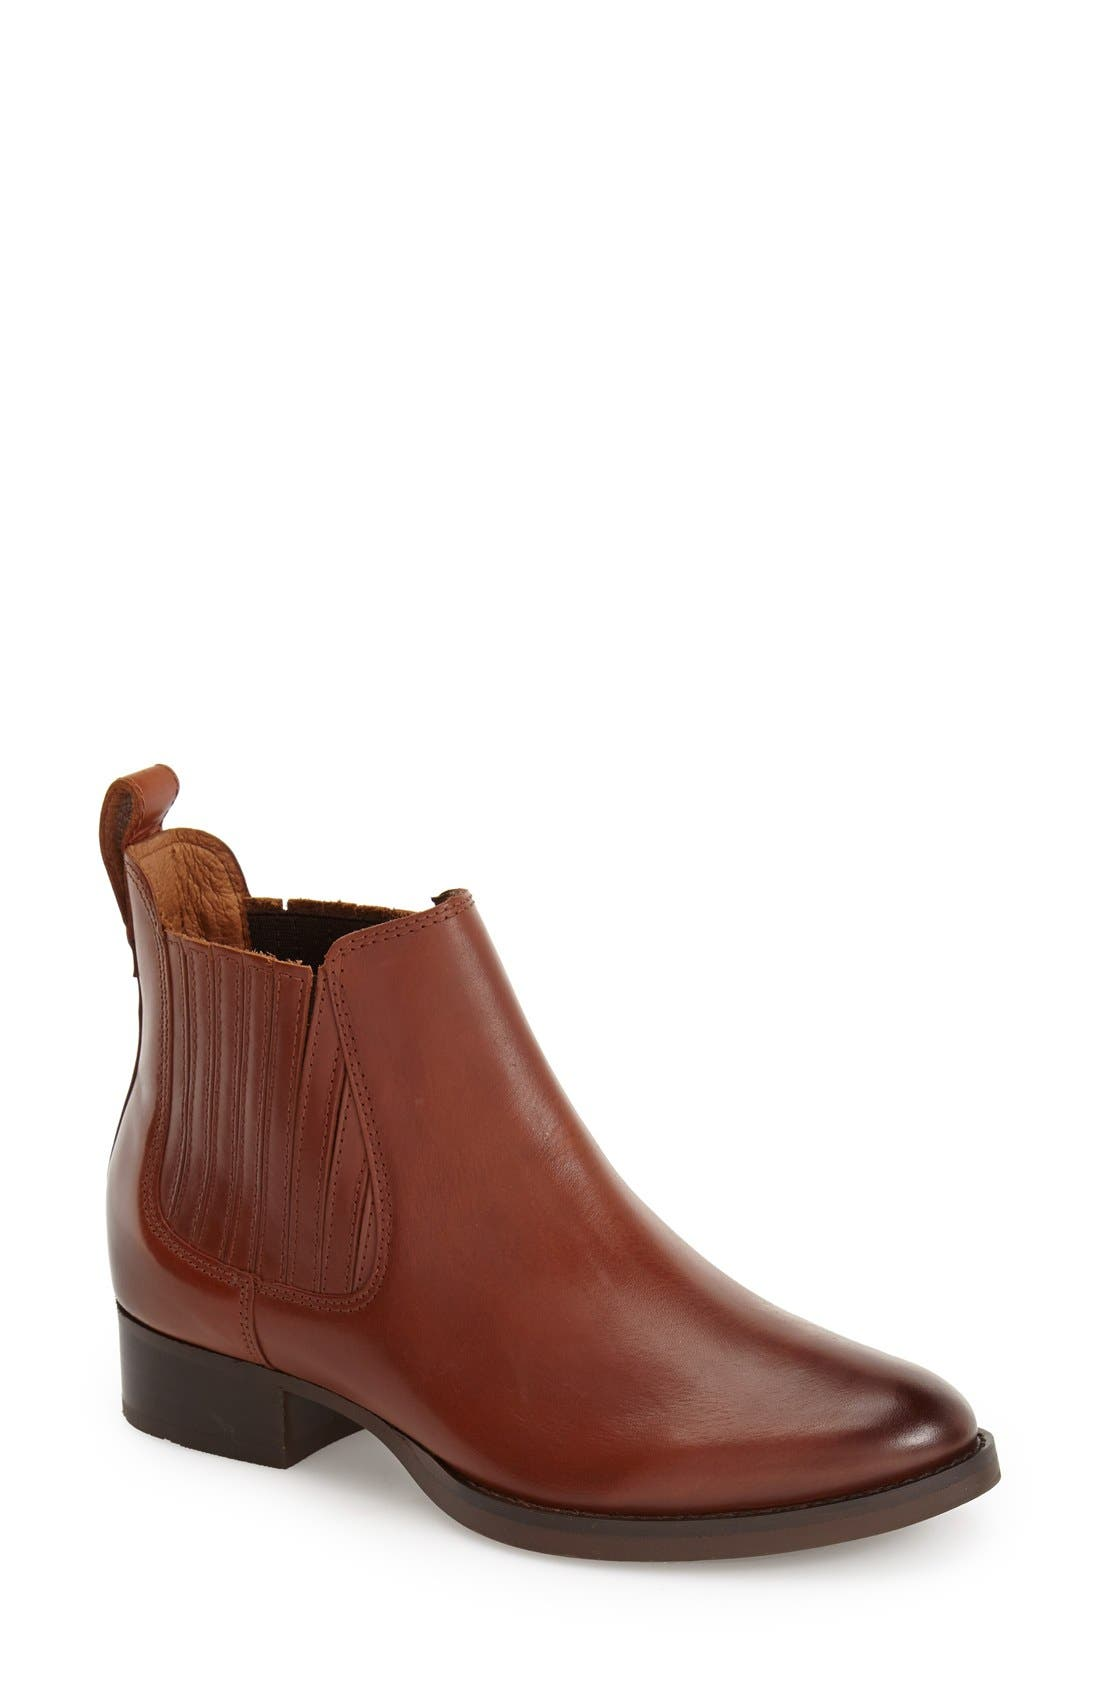 Main Image - Ariat 'Weekend' Boot (Women)